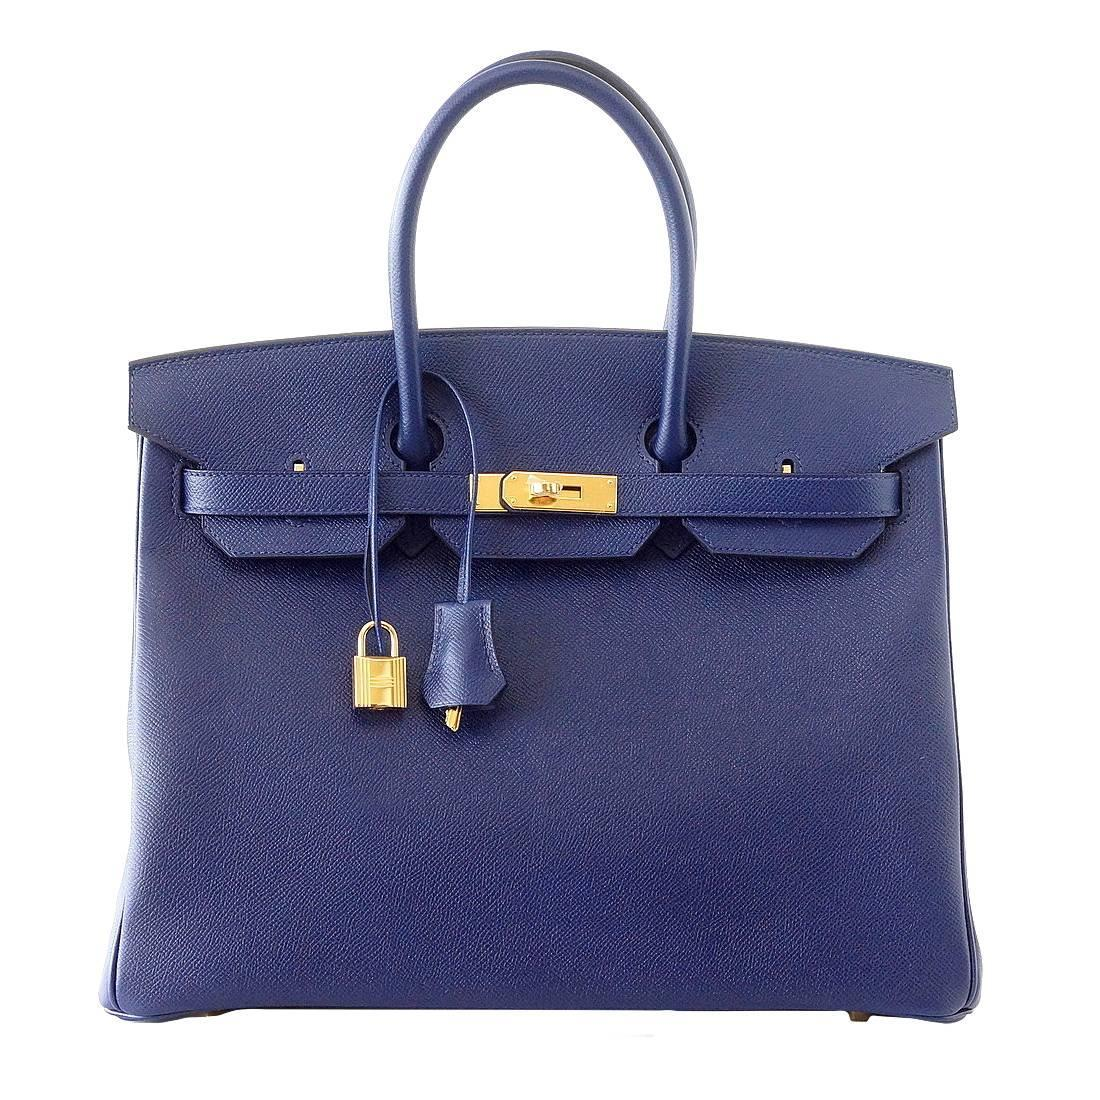 HERMES BIRKIN 35 bag BLEU SAPHIR (SAPPHIRE) epsom coveted gold ...